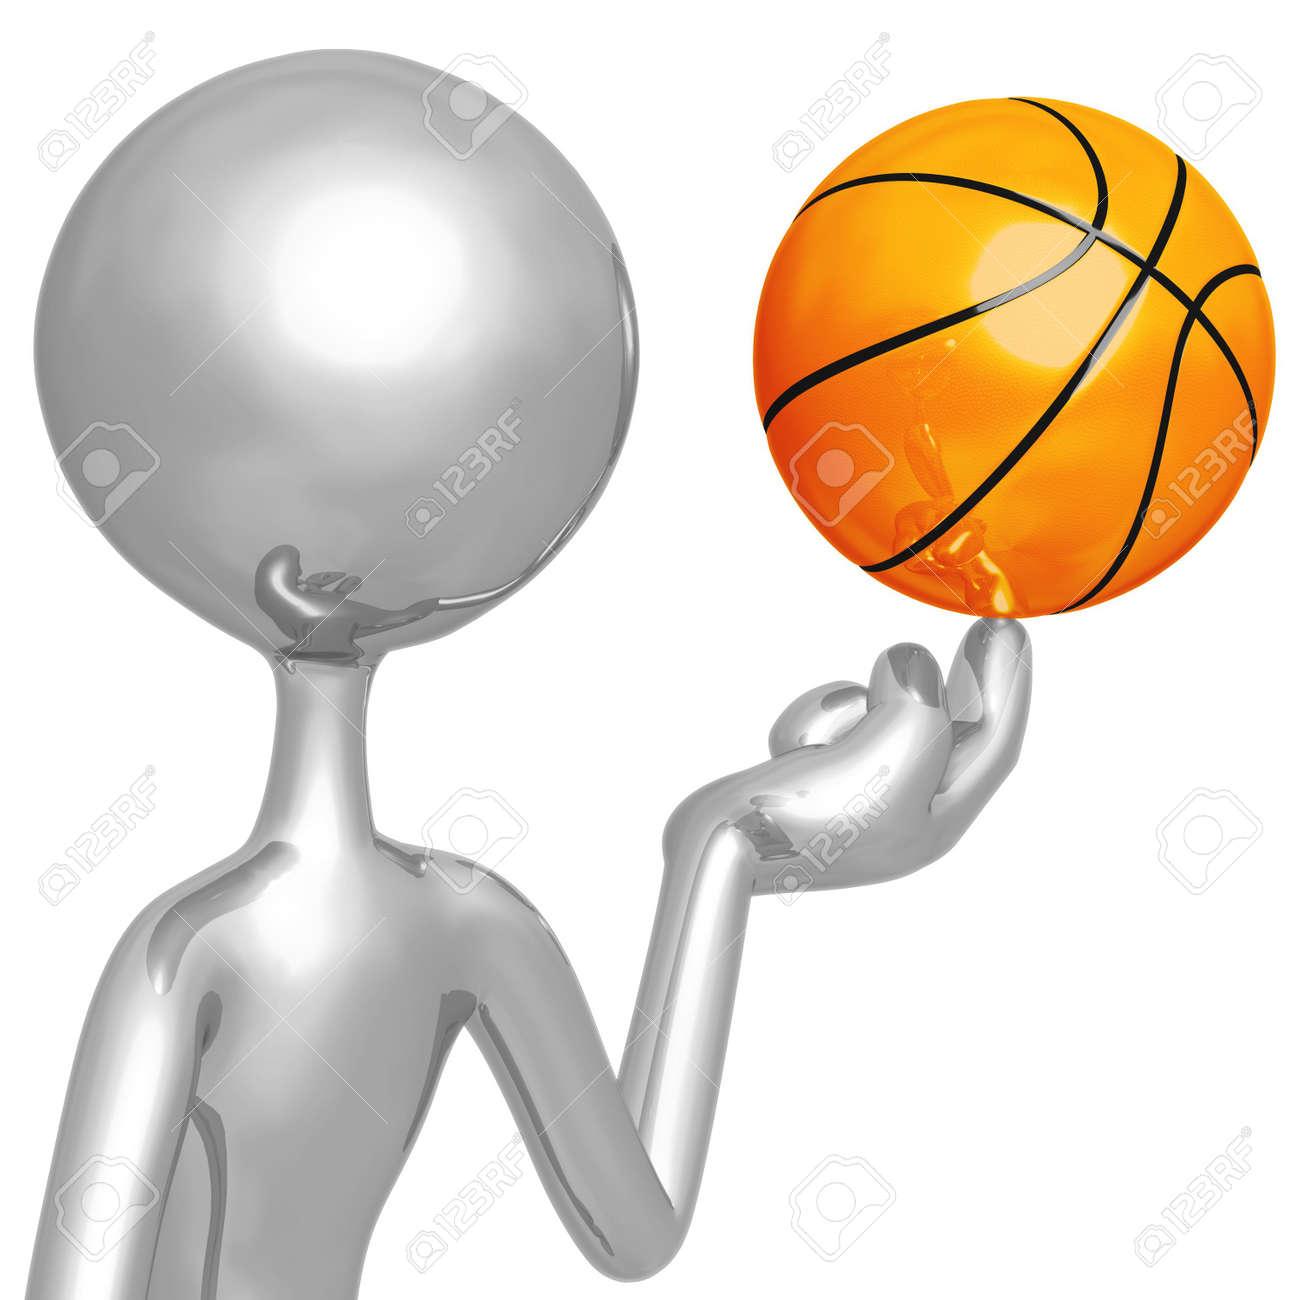 Spinning Basketball Stock Photo - 4356218